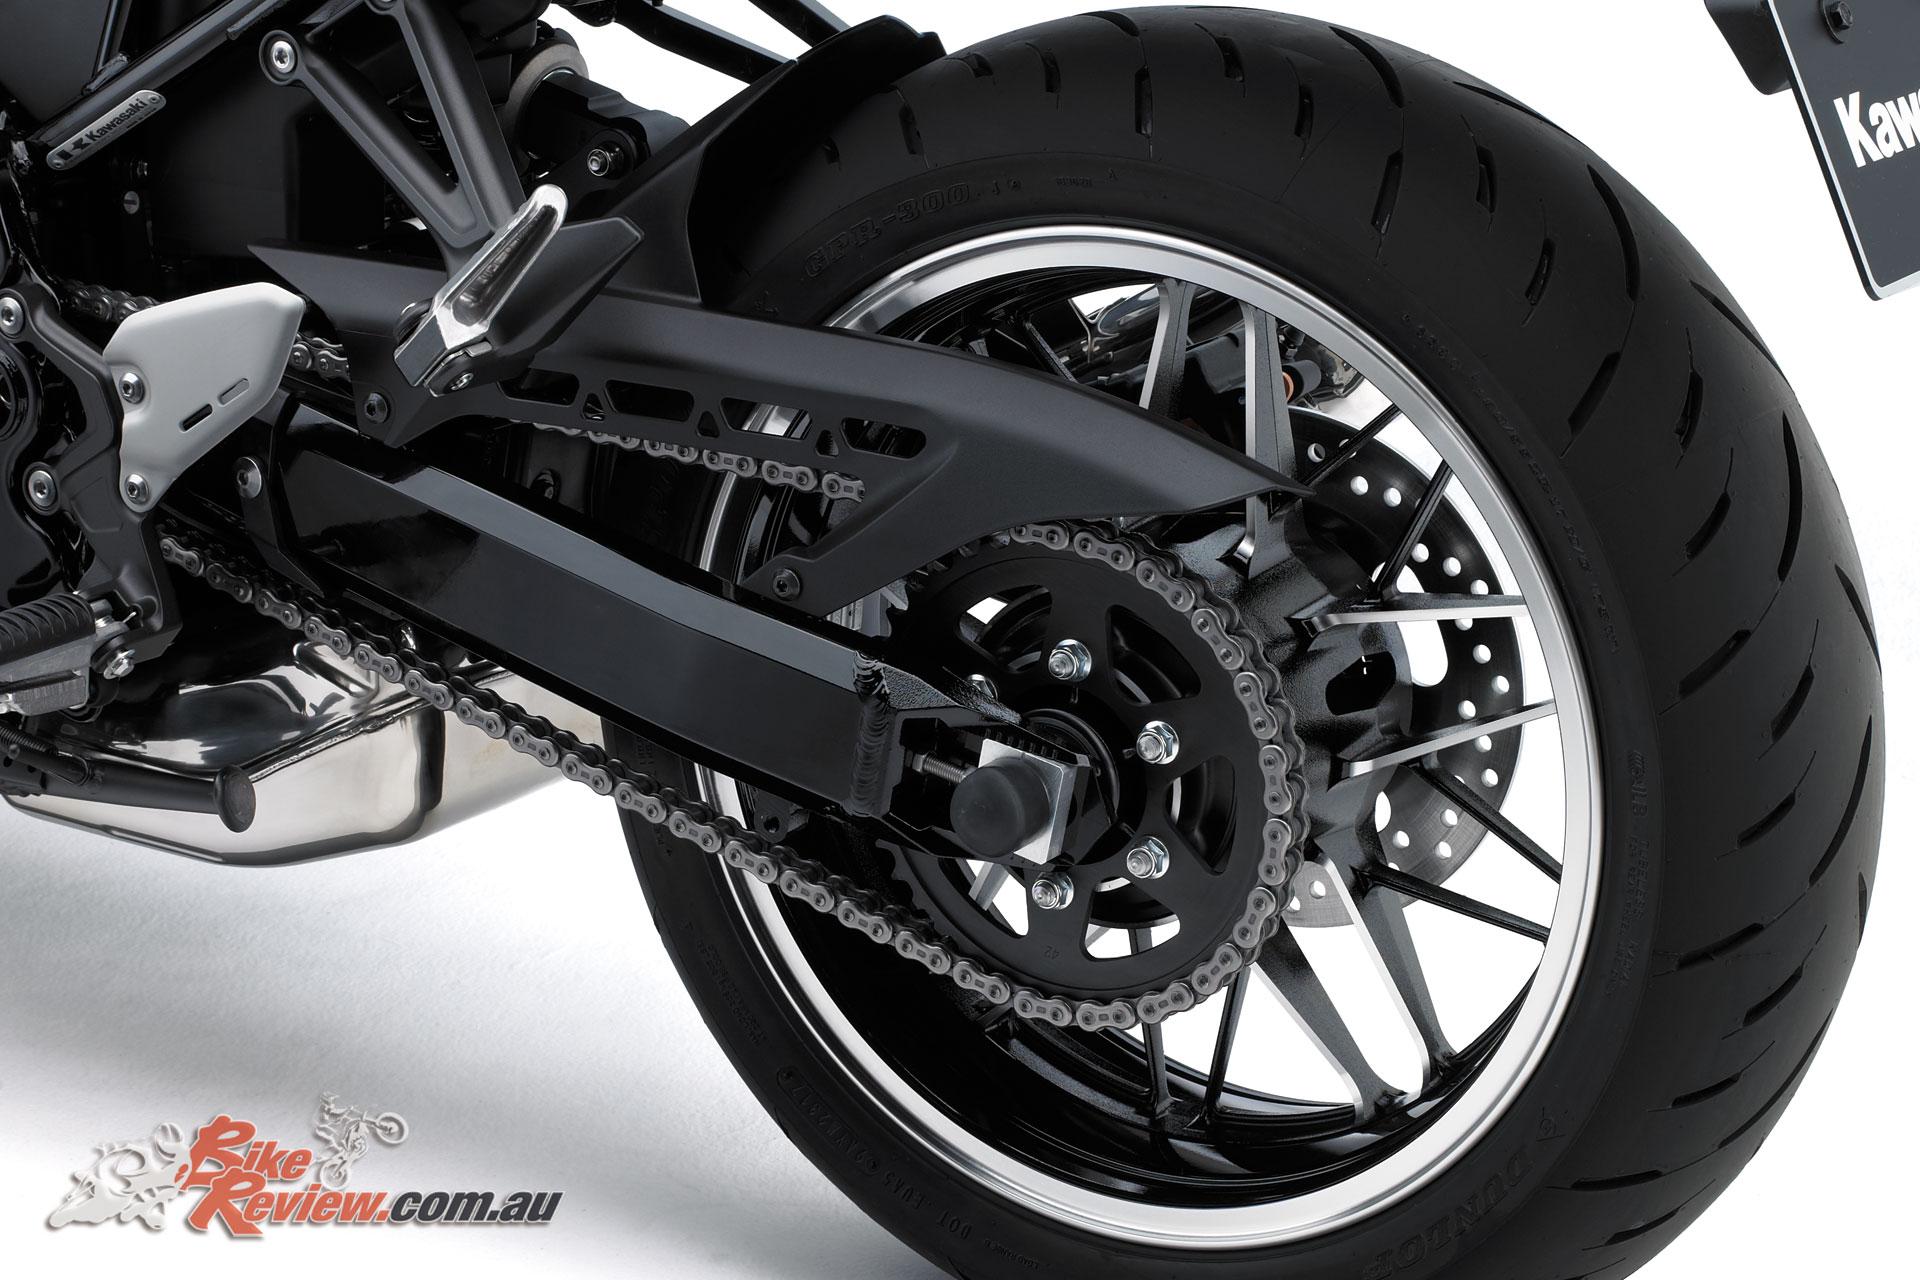 Z900RS rear wheel and swingarm